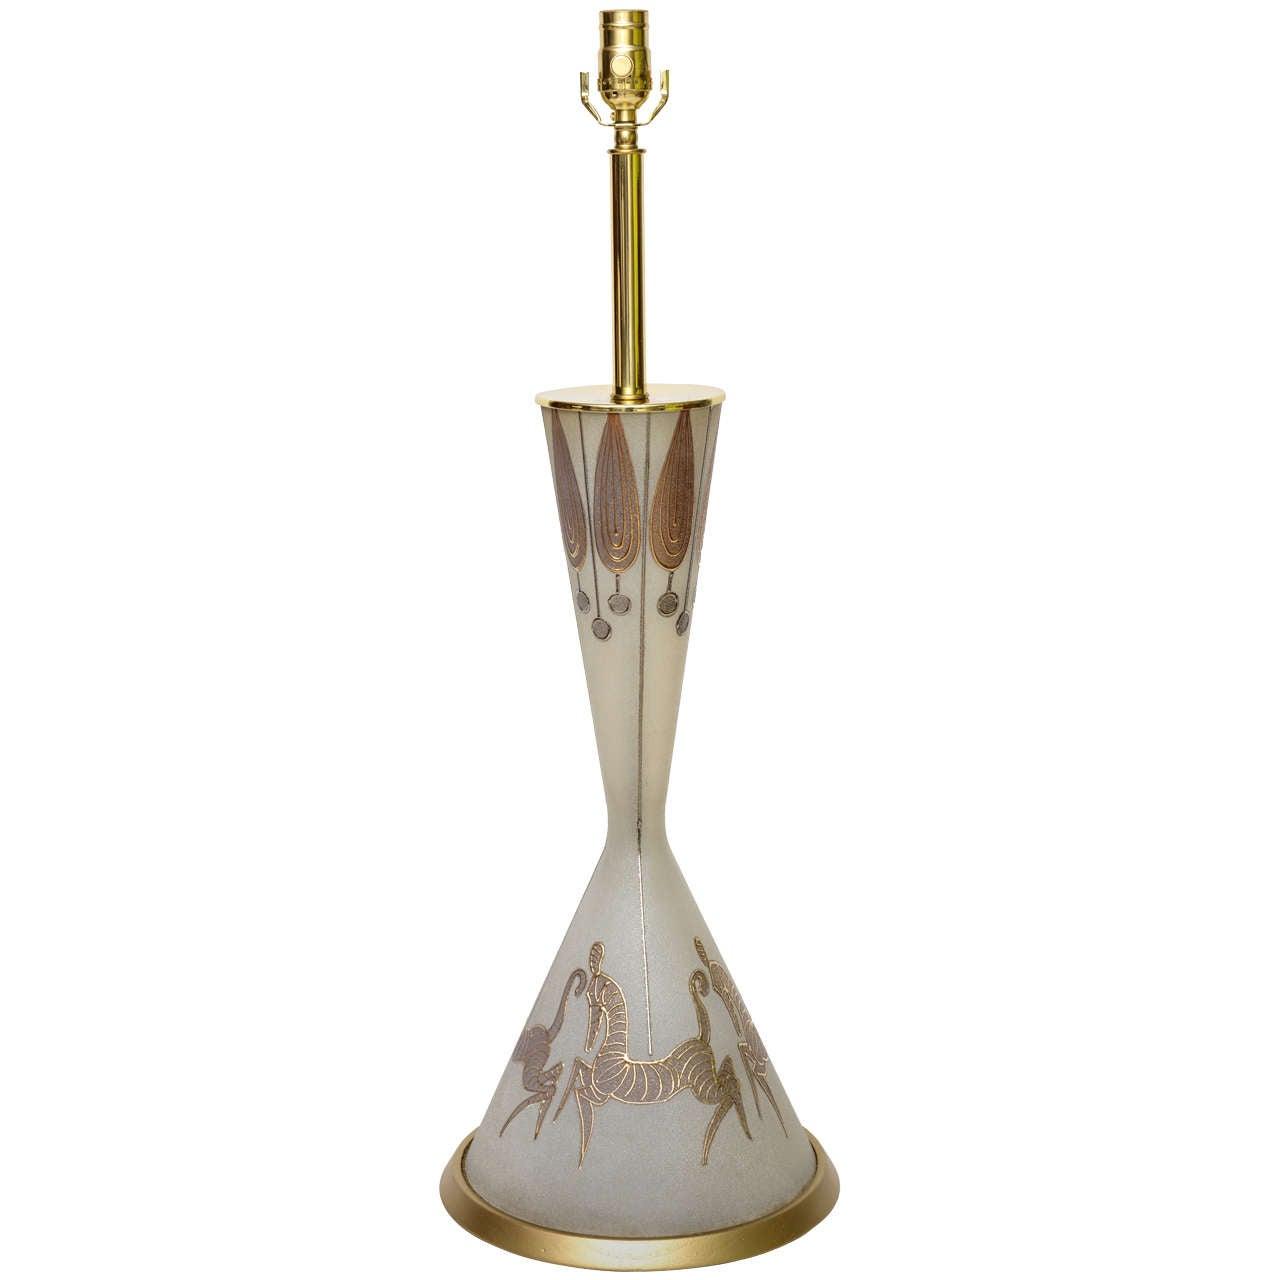 Tall Waylande Gregory Style Zebra Carousel Motif Table Lamp